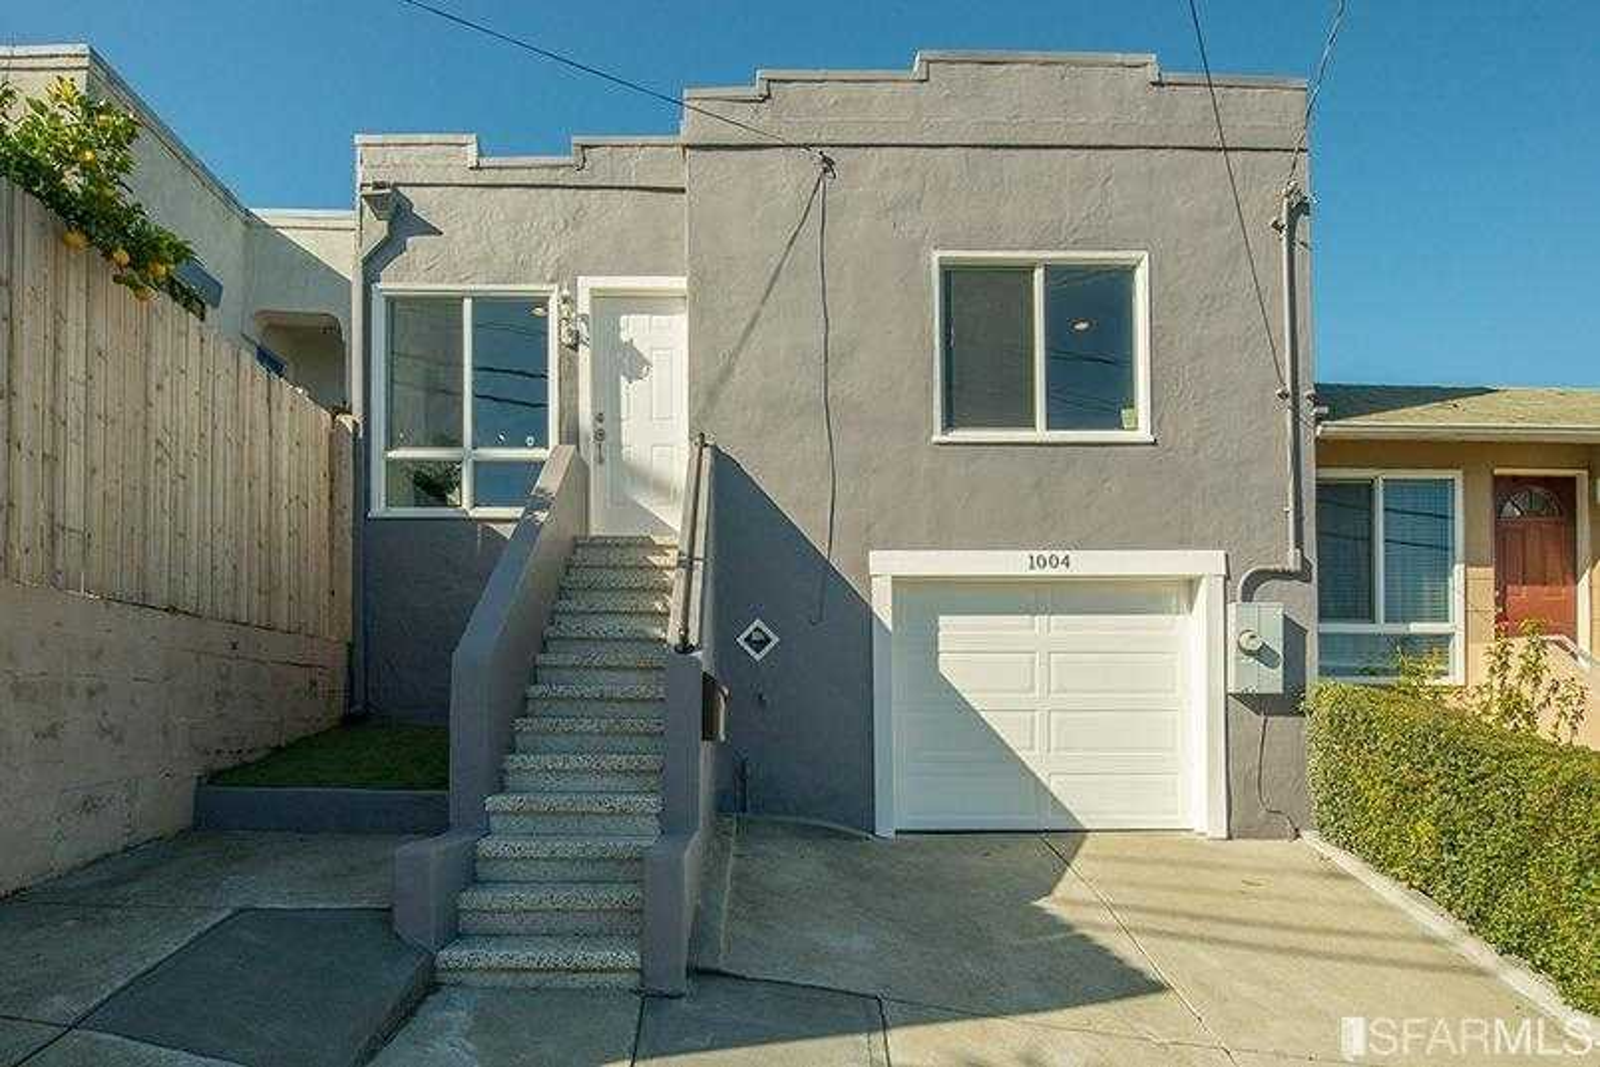 1004 Schwerin St Daly City, CA 94014